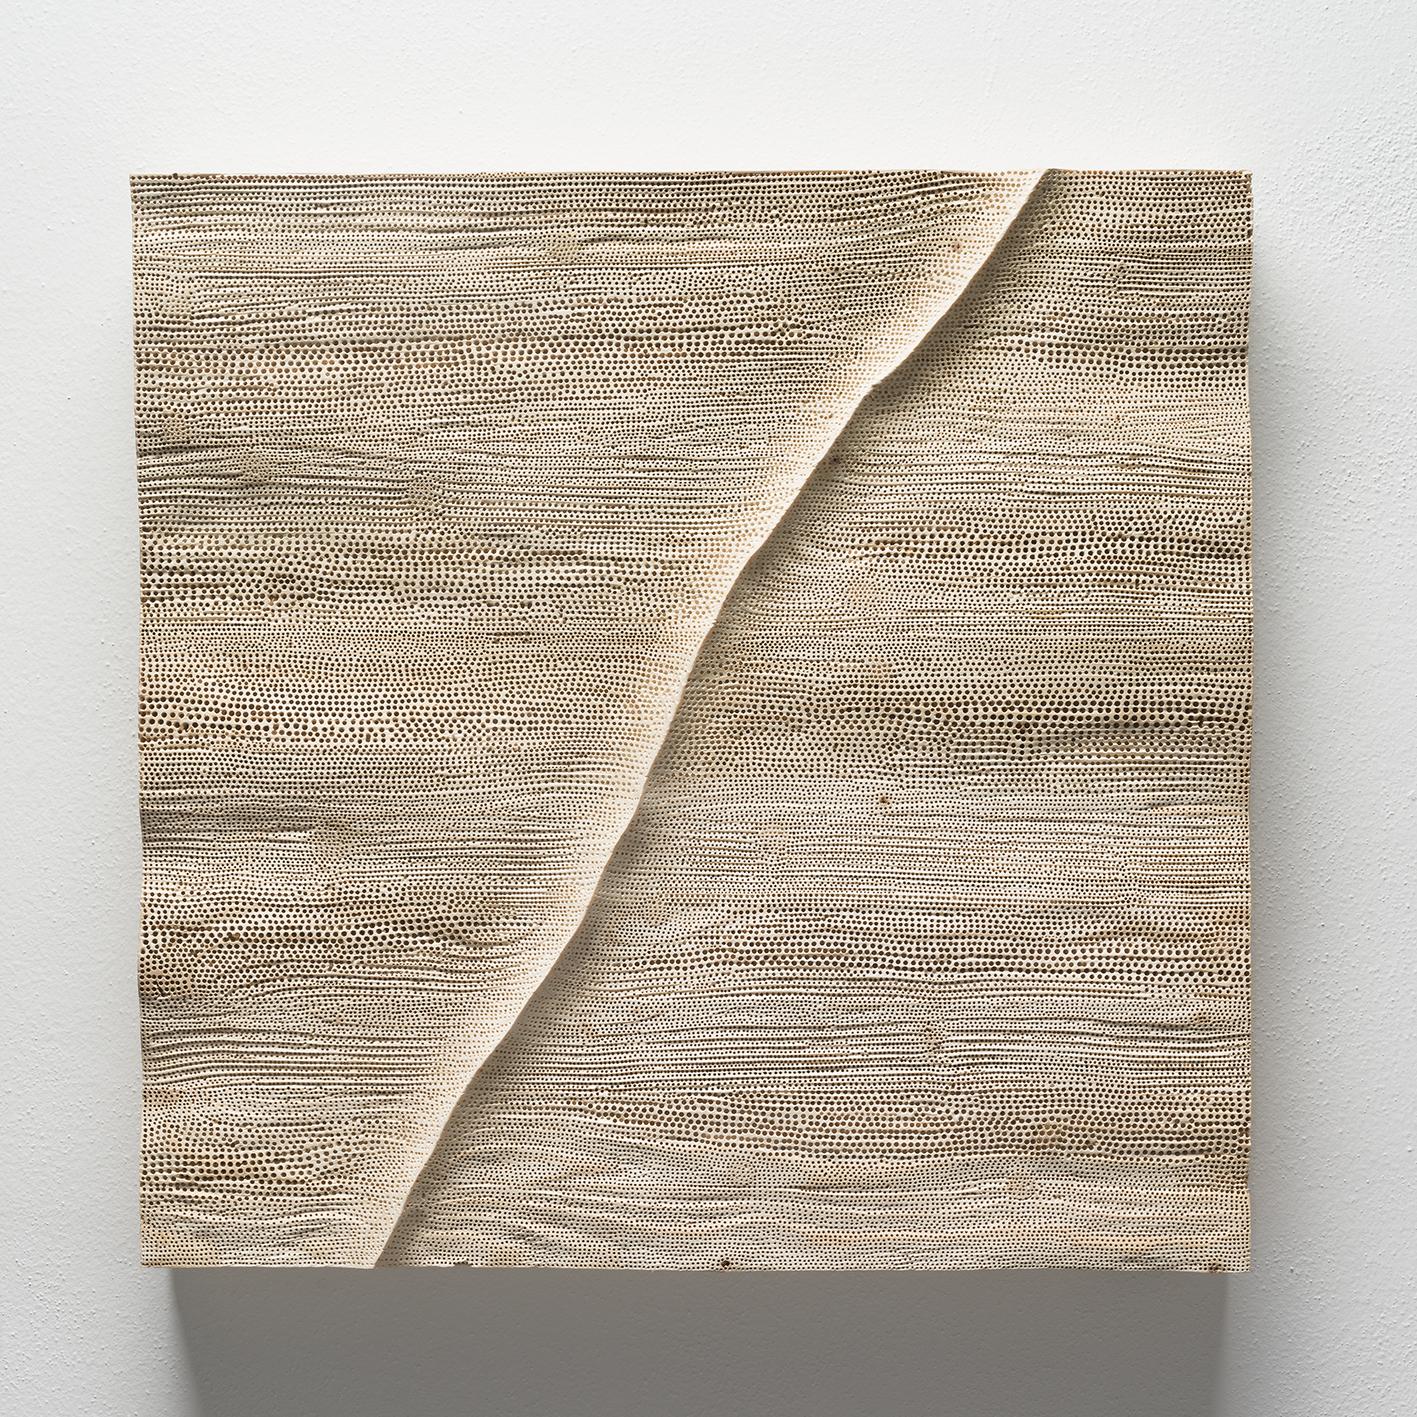 Hřbet, 62x62 cm, dřevo, prodáno